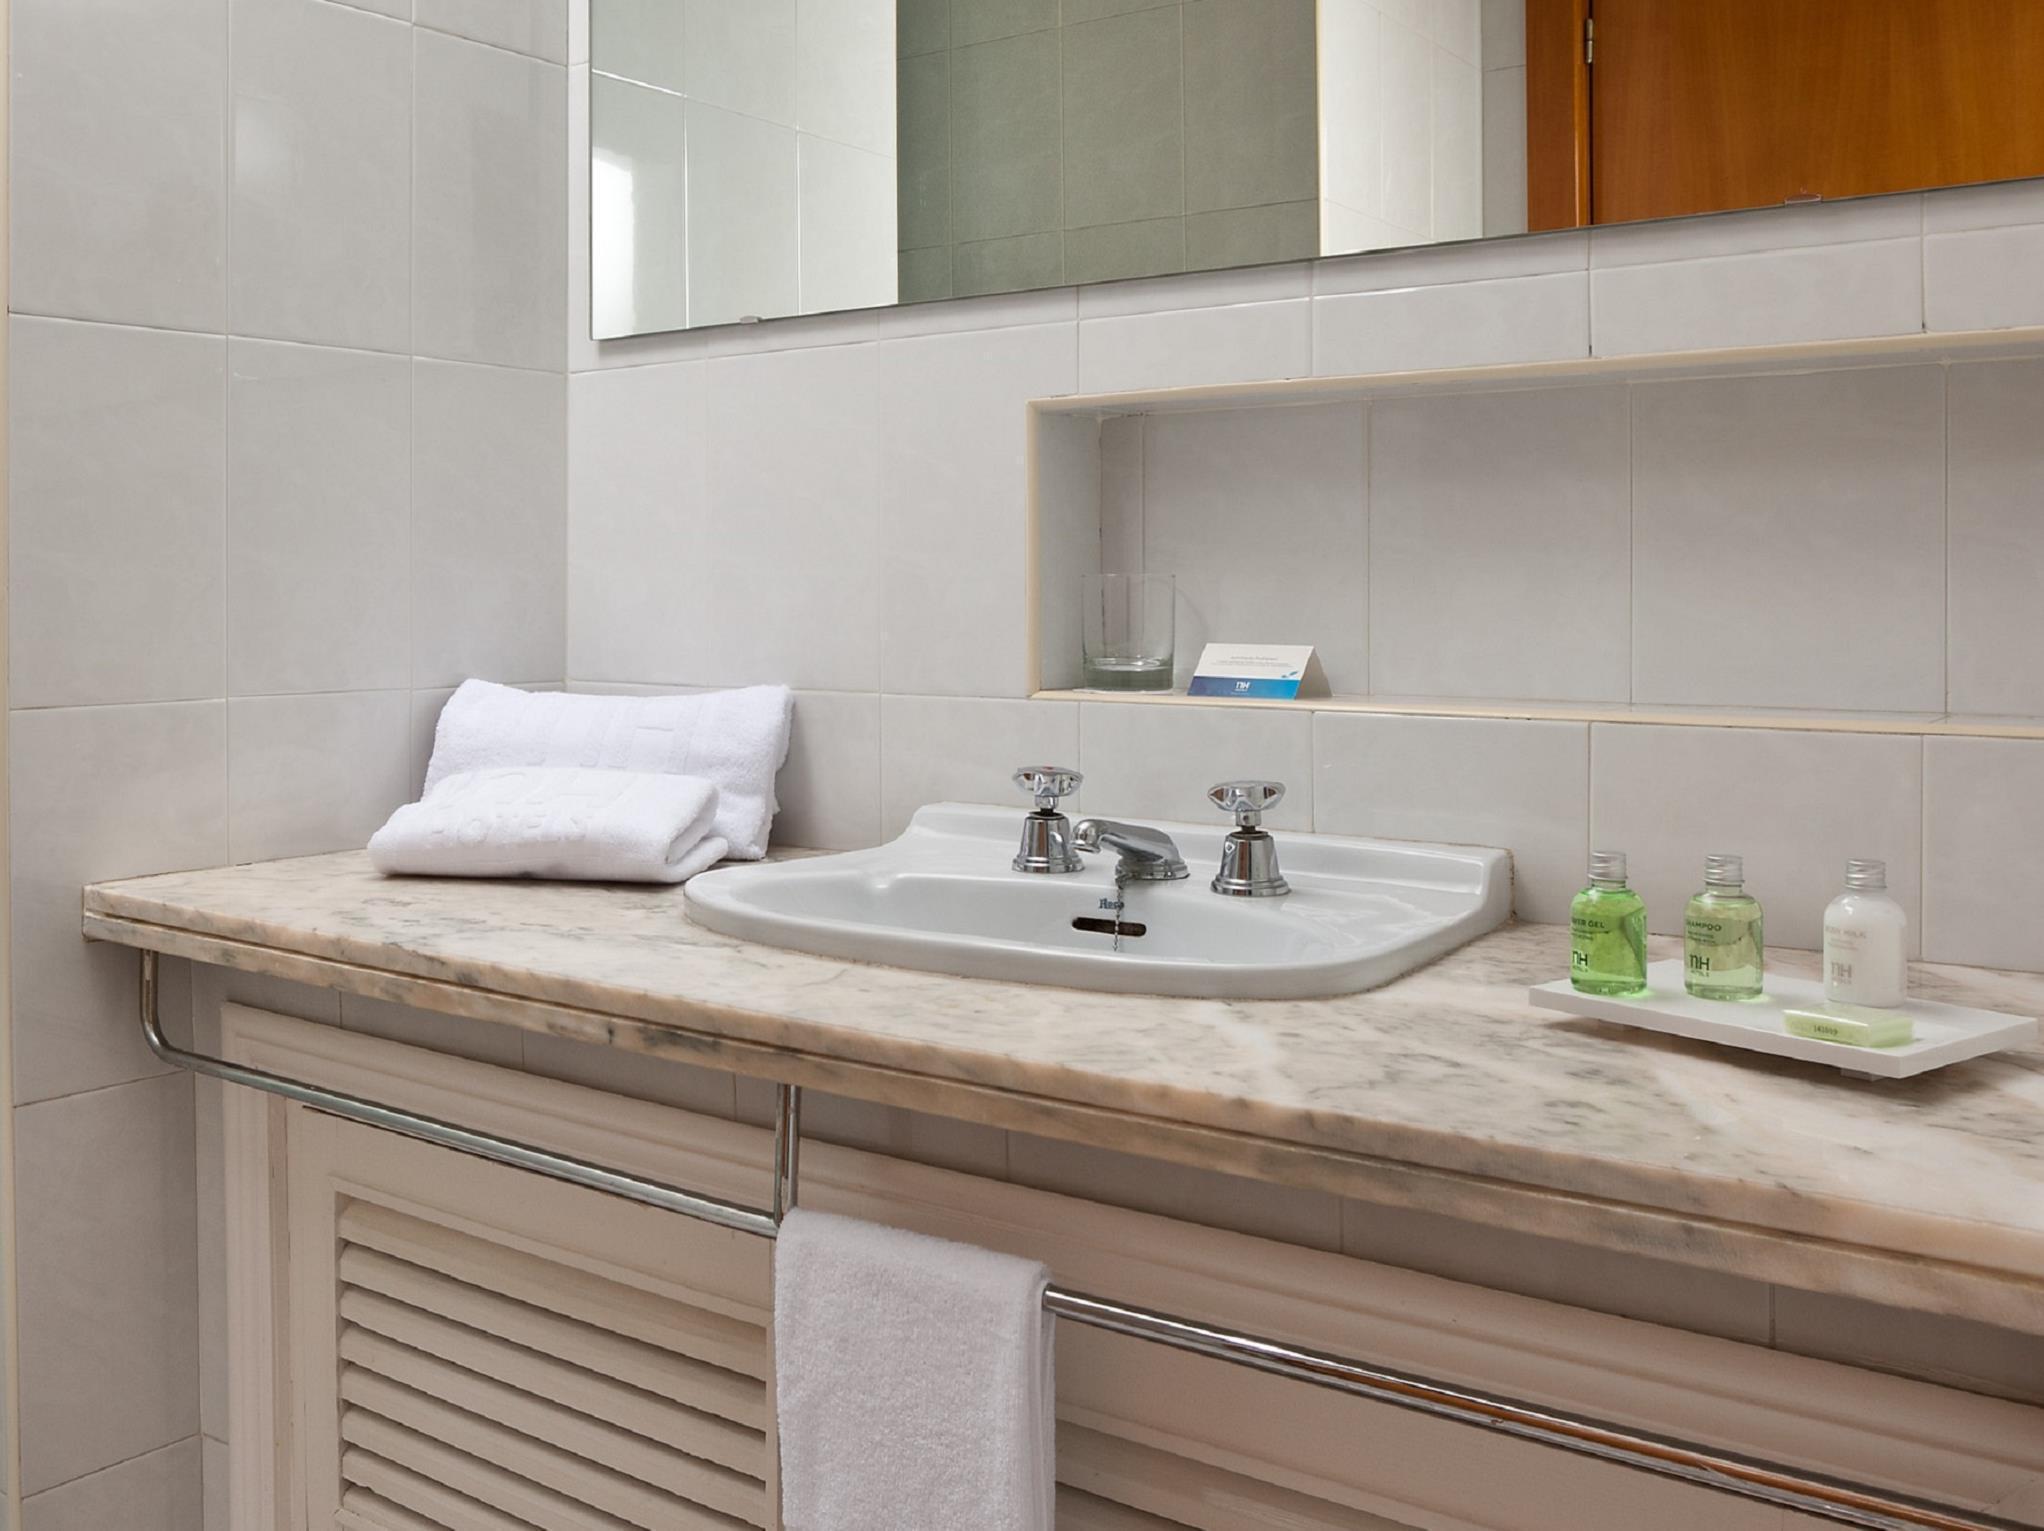 Nh Luz Huelva Hotel